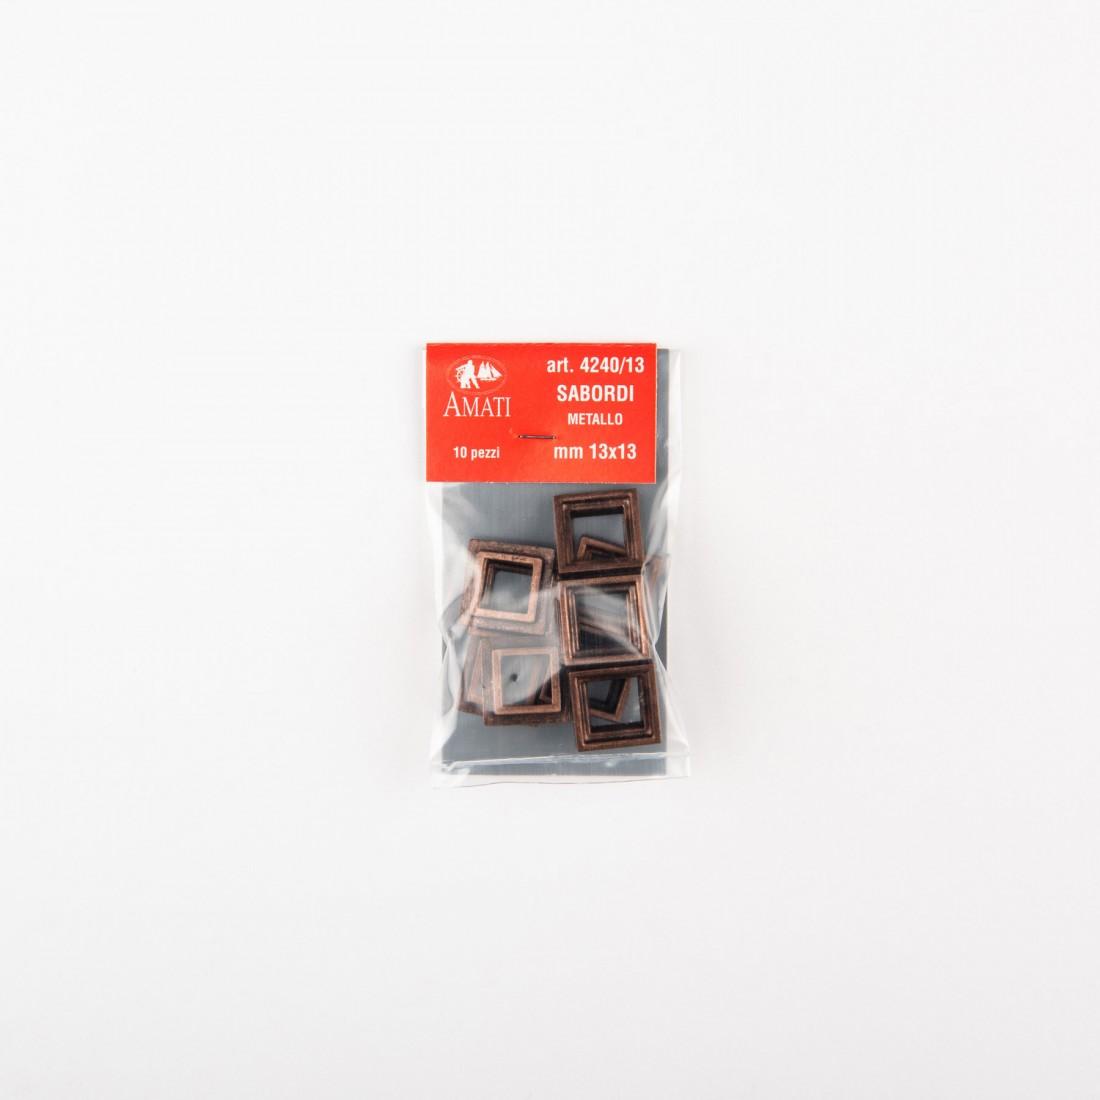 Entourages sabords mm.13x13